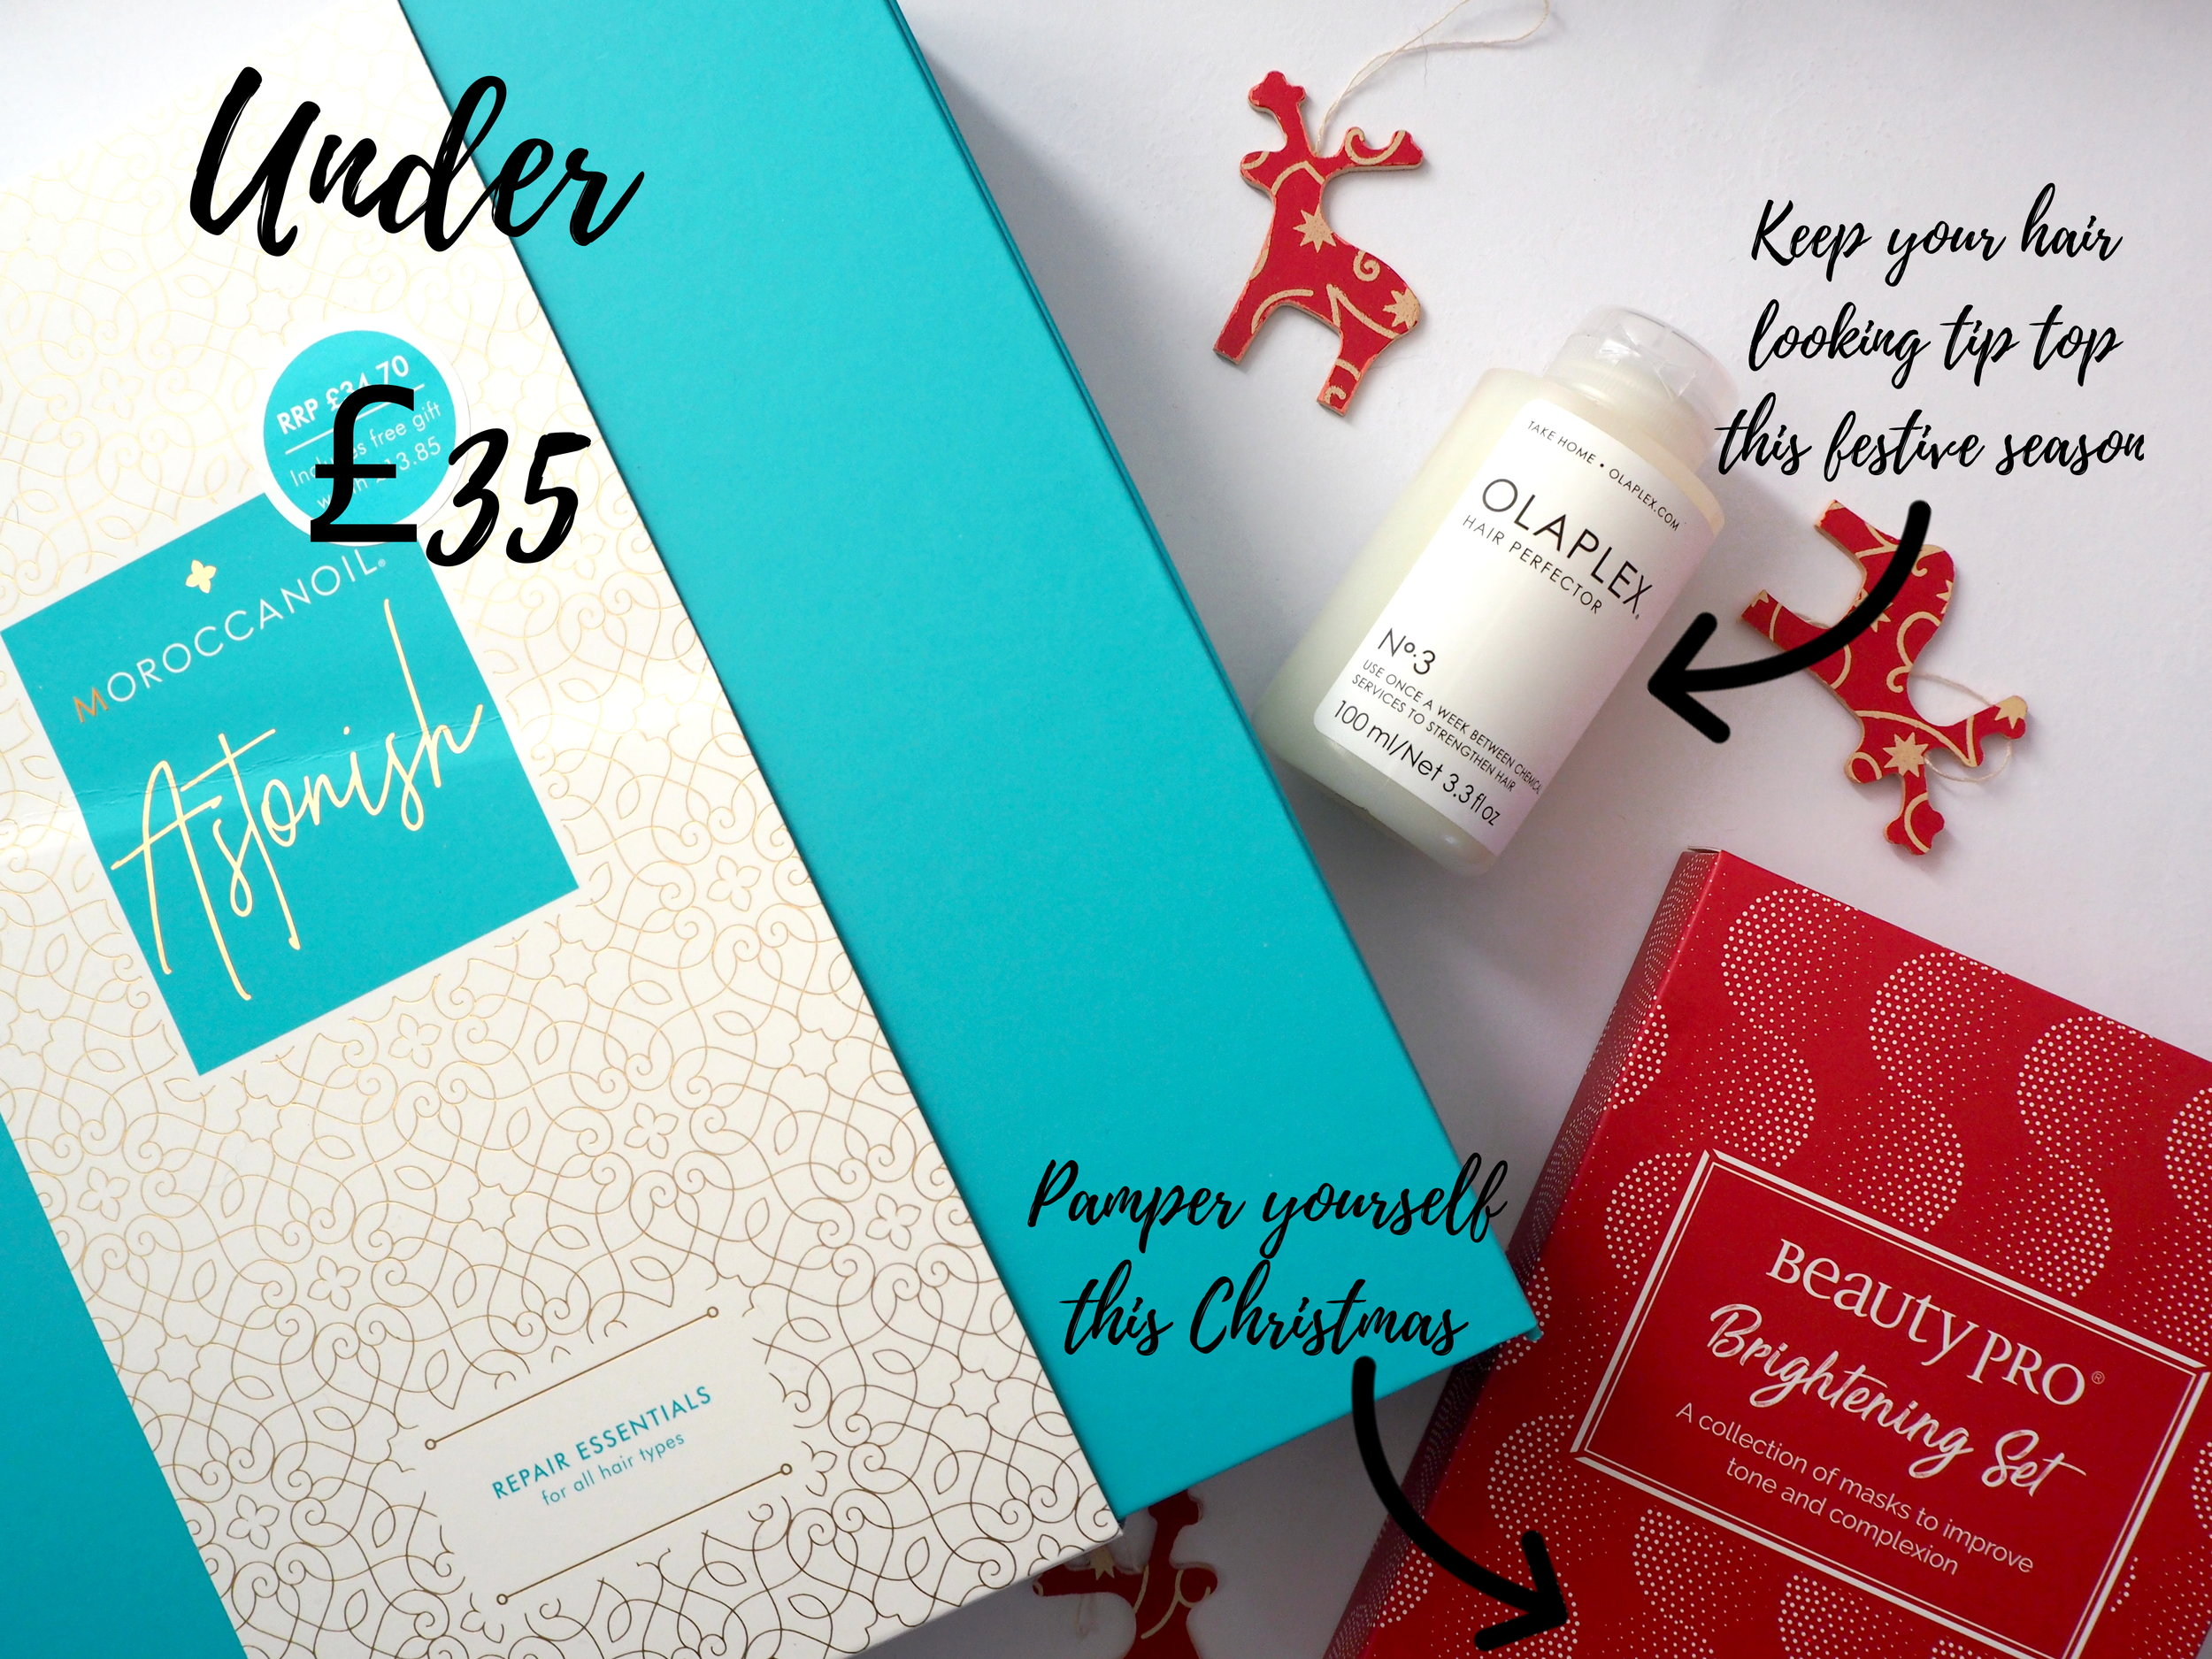 Venus-Beauty-Hair-Tavistock-Devon-Salon-Christmas-Gift-Guide-Moroccon-Oil-Beauty-Pro-FaceMasks-Olaplex-Under-35.JPG